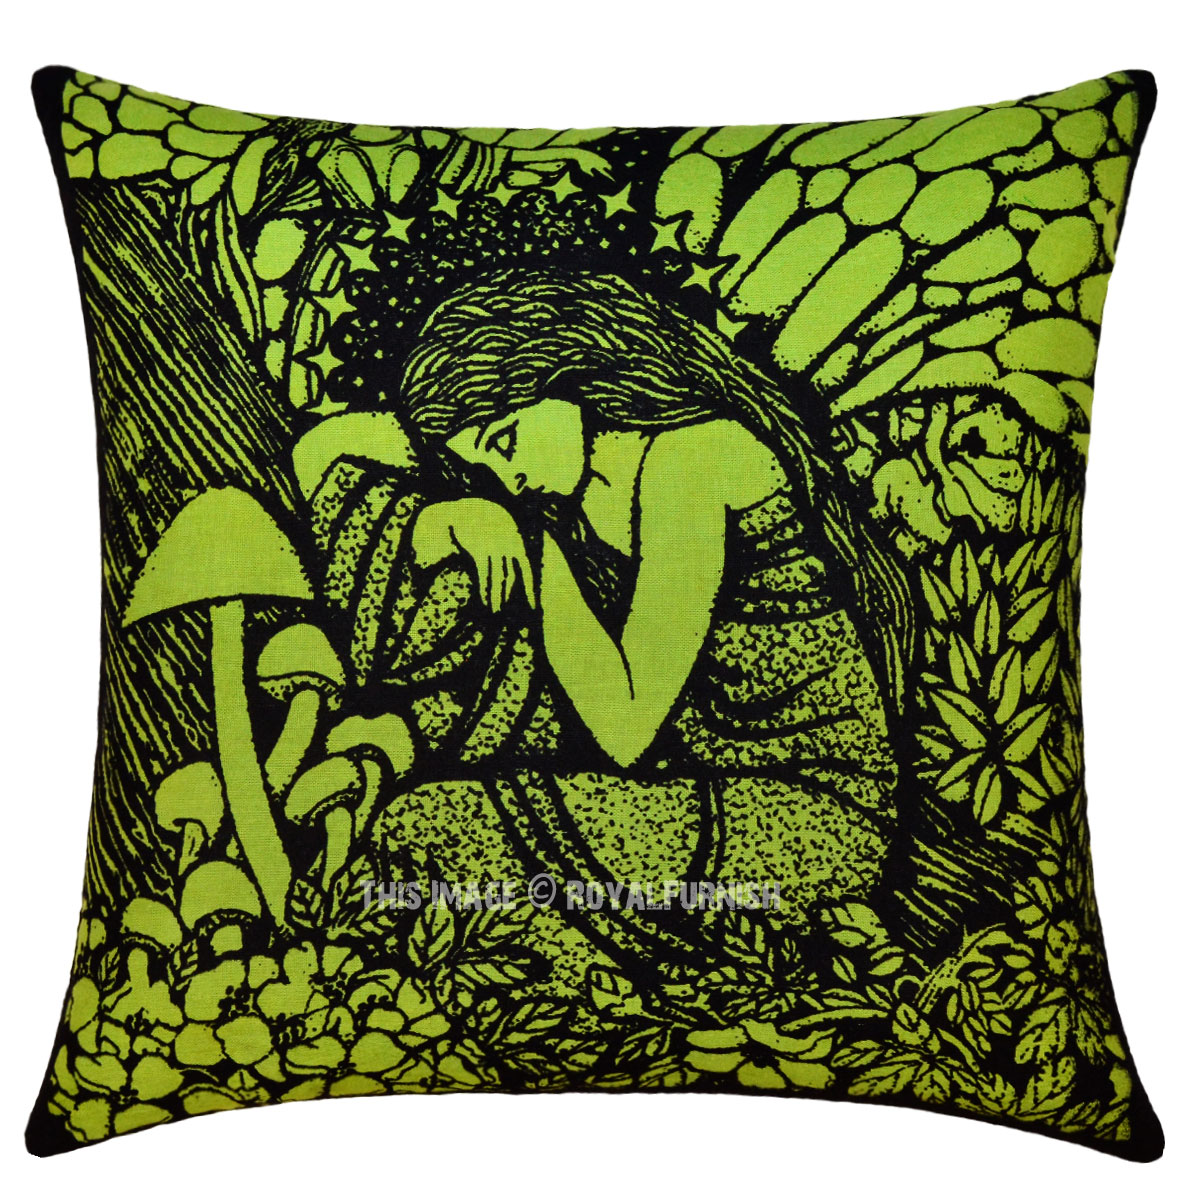 Green Fairy Queen Decorative Hippie Tie Dye Cotton Square Pillow Cover 16X16 - RoyalFurnish.com